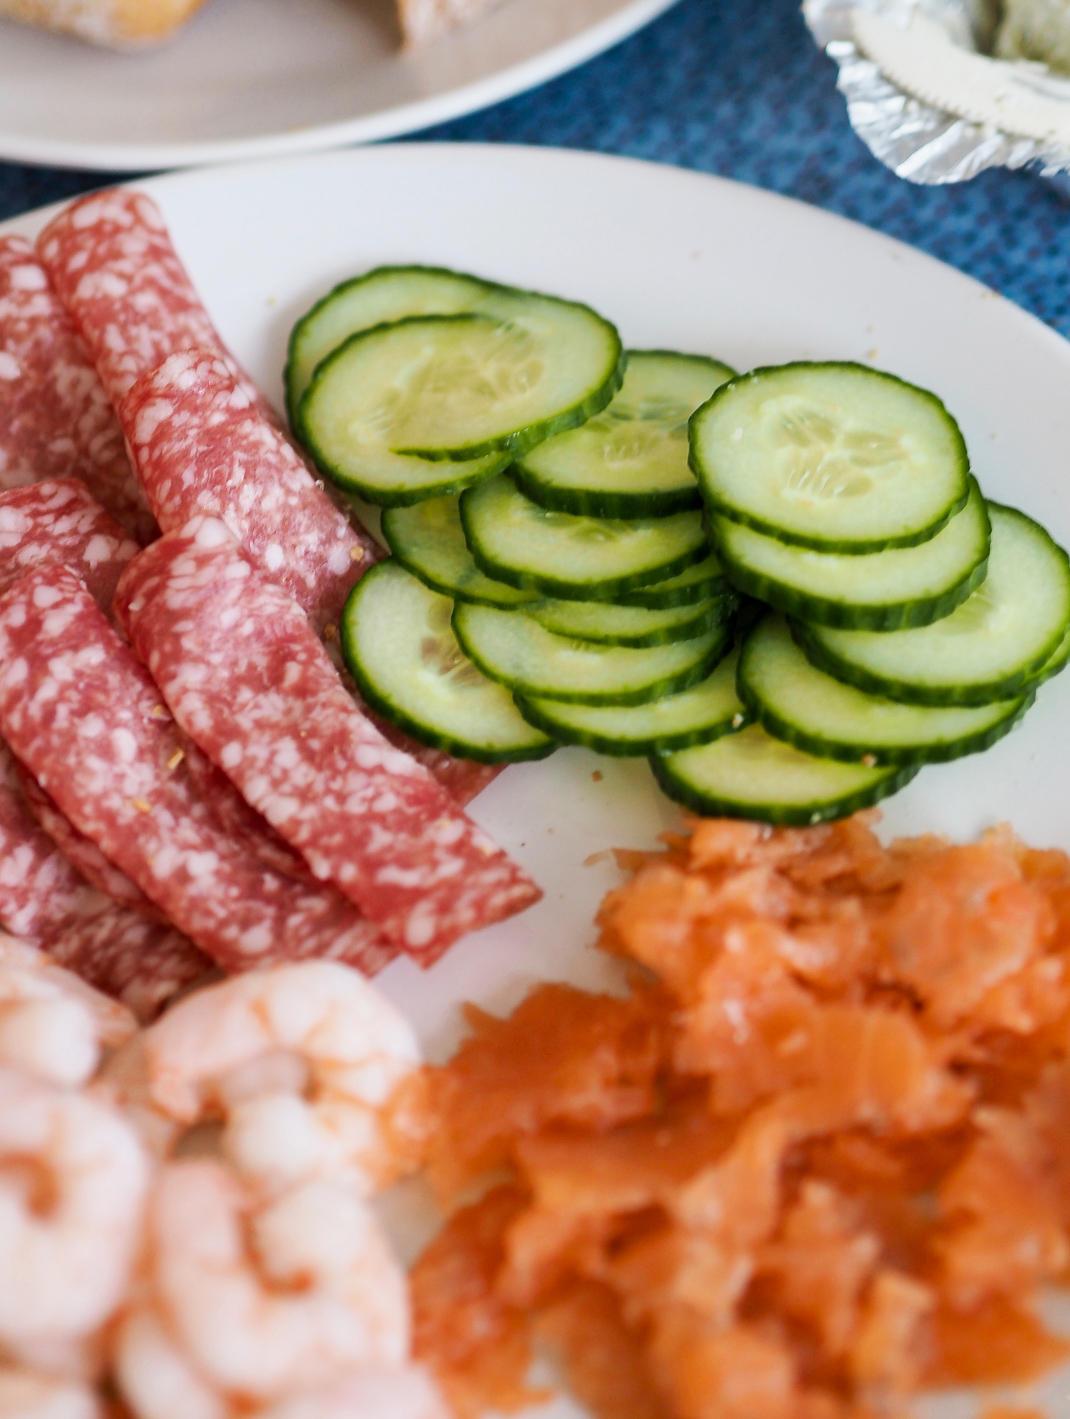 salami, cucumber, salmon and prawns